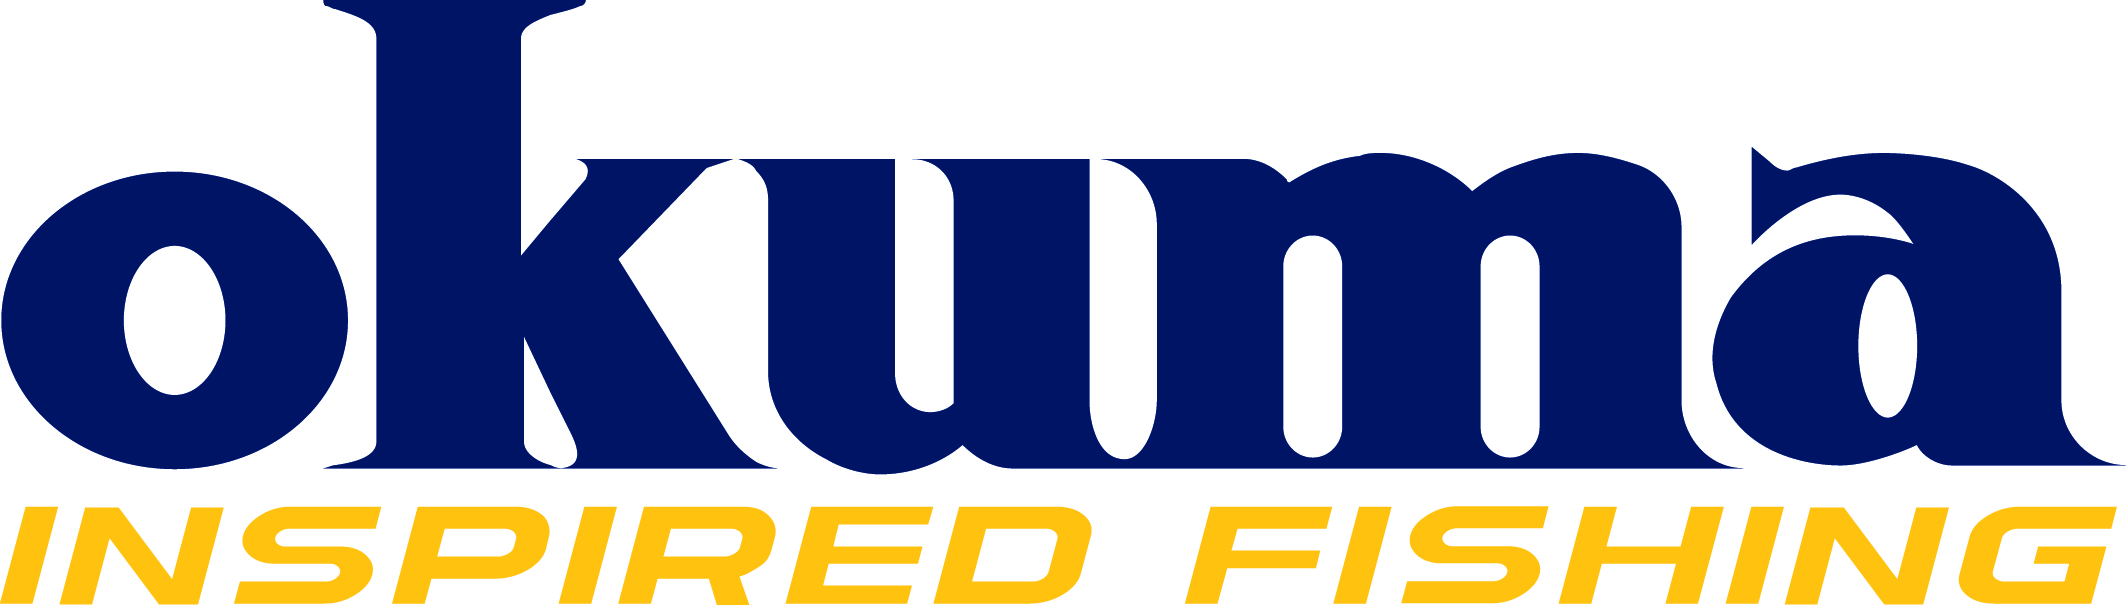 Inspired Fishing logo final.jpg